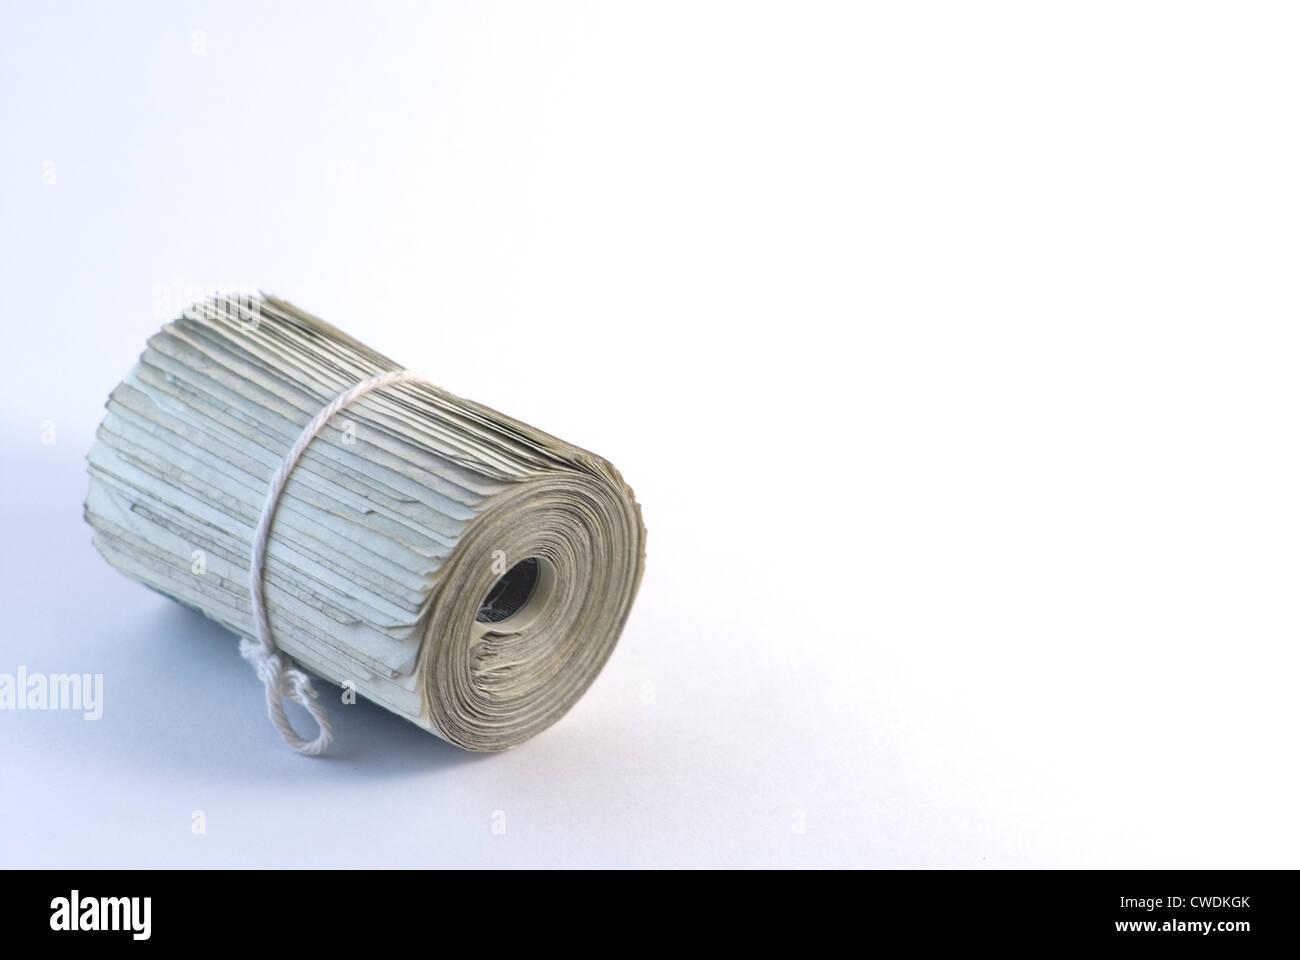 Neatly Rolled CashStock Photo